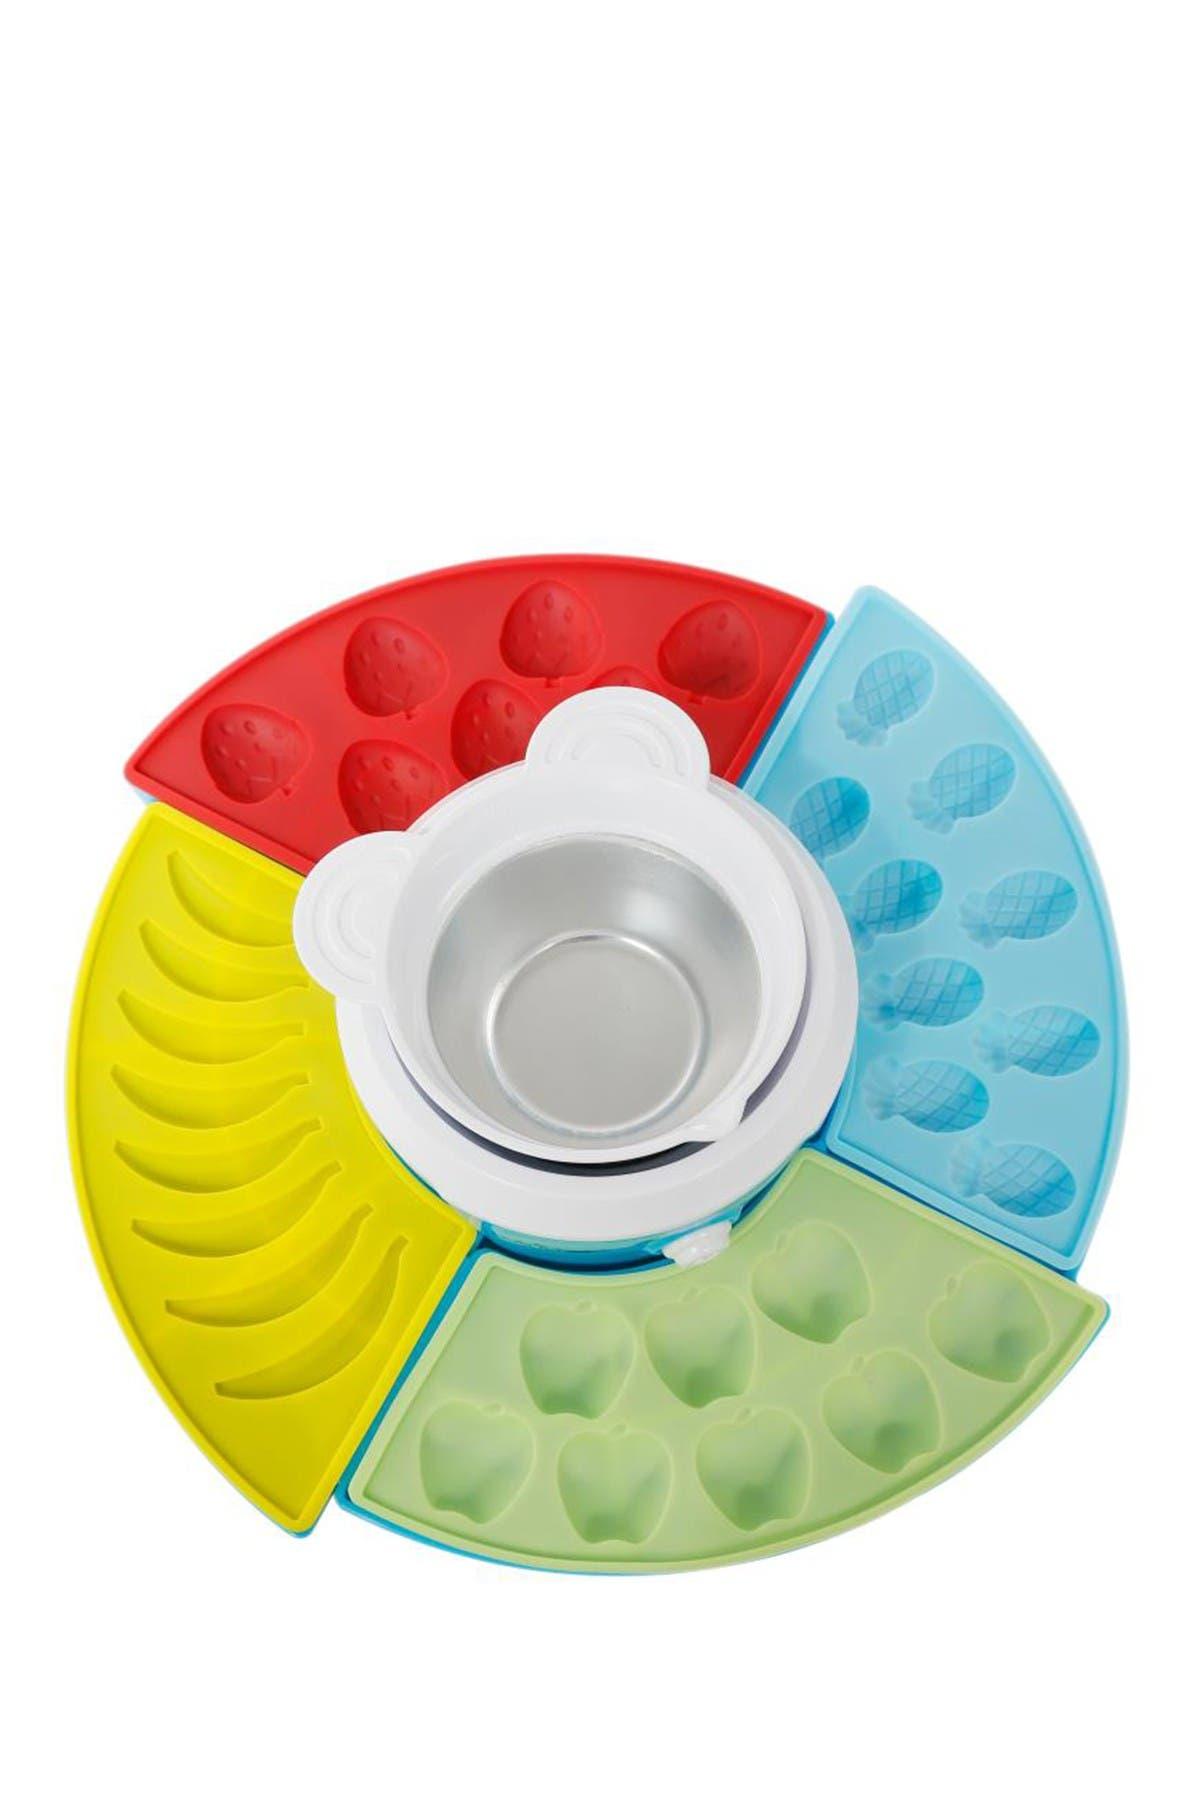 Image of NutriChef Gummy Candy Maker